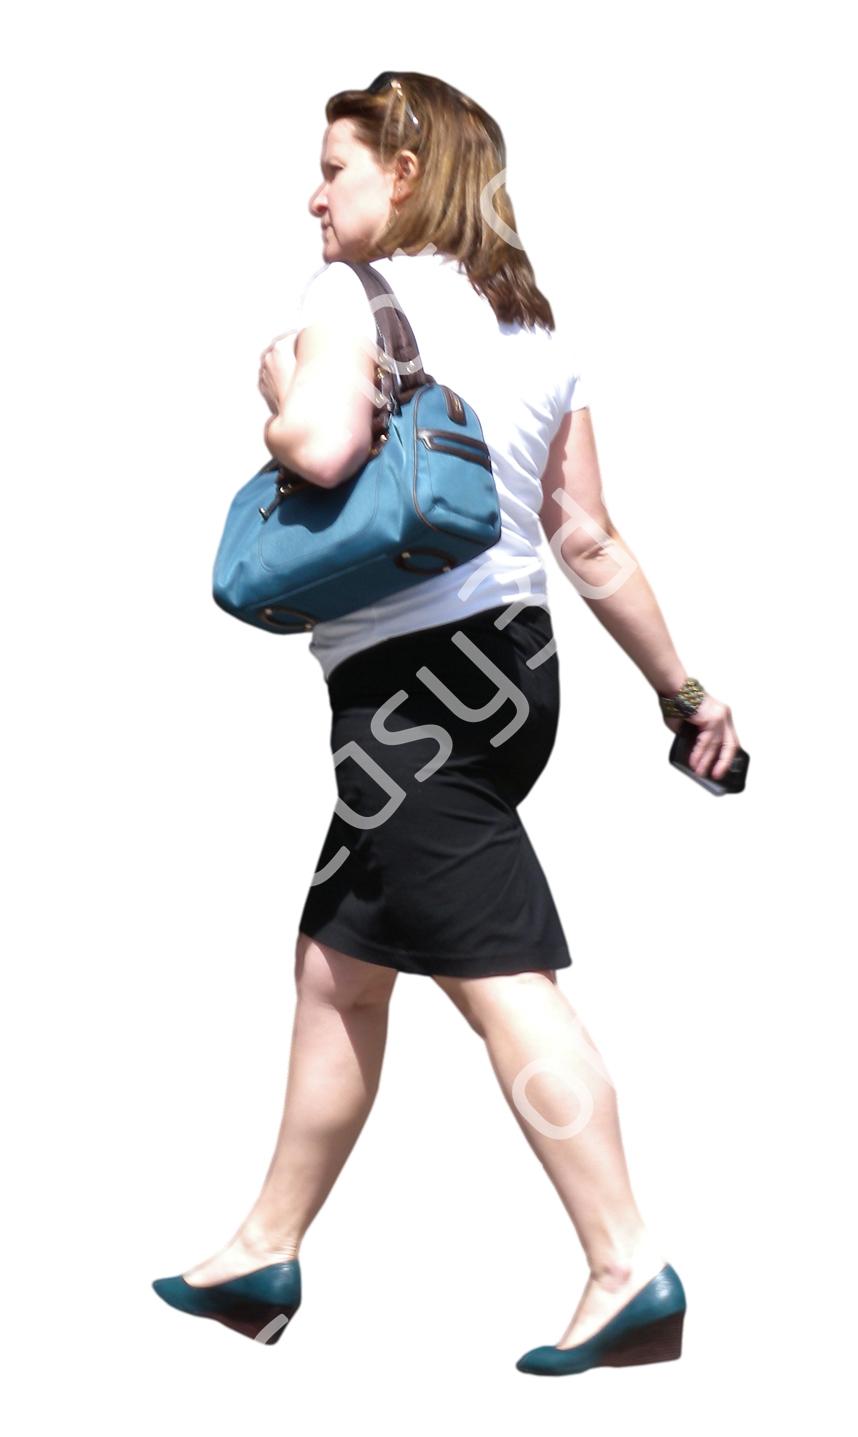 (Single) Business People V. 1 #040 woman, walking